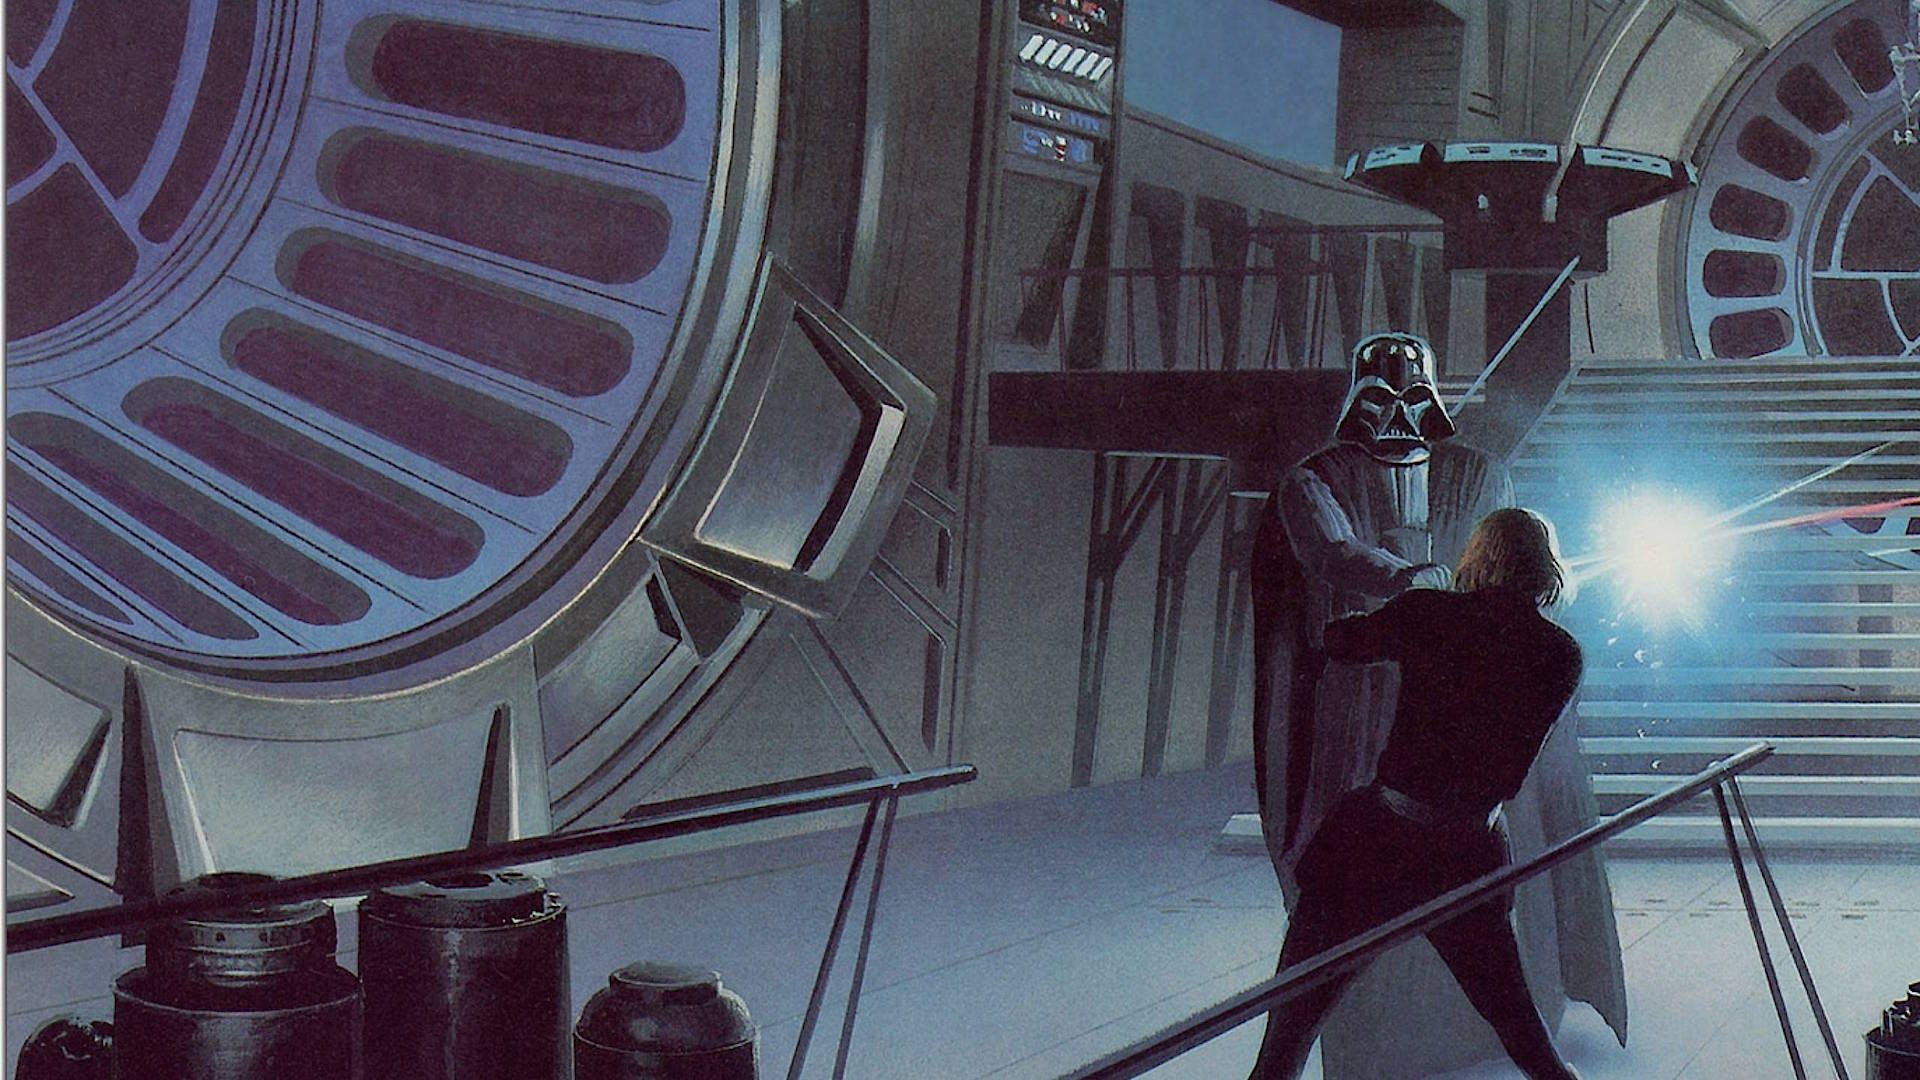 Ralph Mcquarrie Star Wars Concept Art Pt 1 Of 2 Album On Imgur Star Wars Concept Art Ralph Mcquarrie Star Wars Art